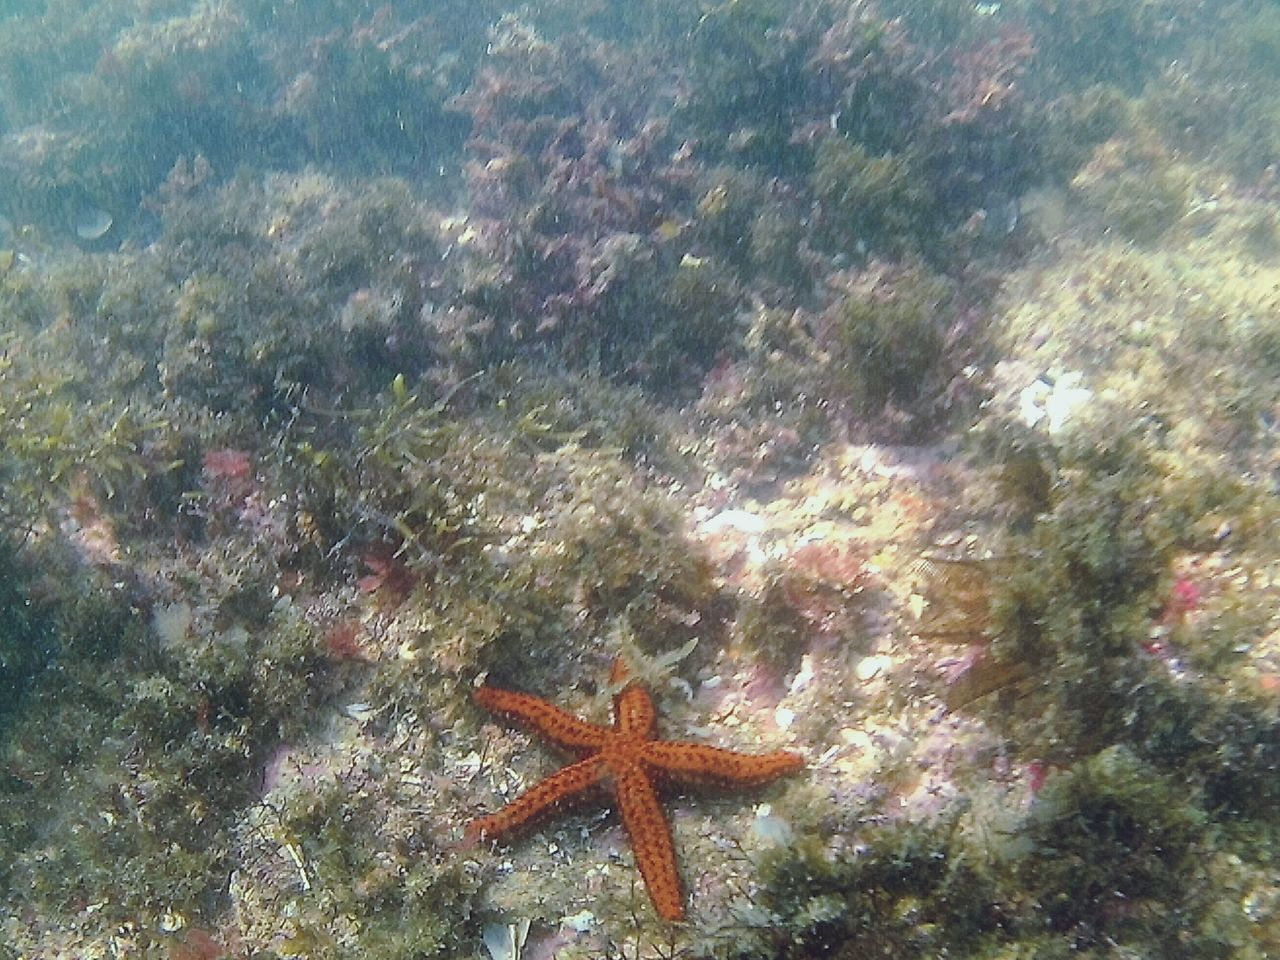 Estreladomar So Beautiful ♥♥ Love It Underwater Waterlove Waterlife